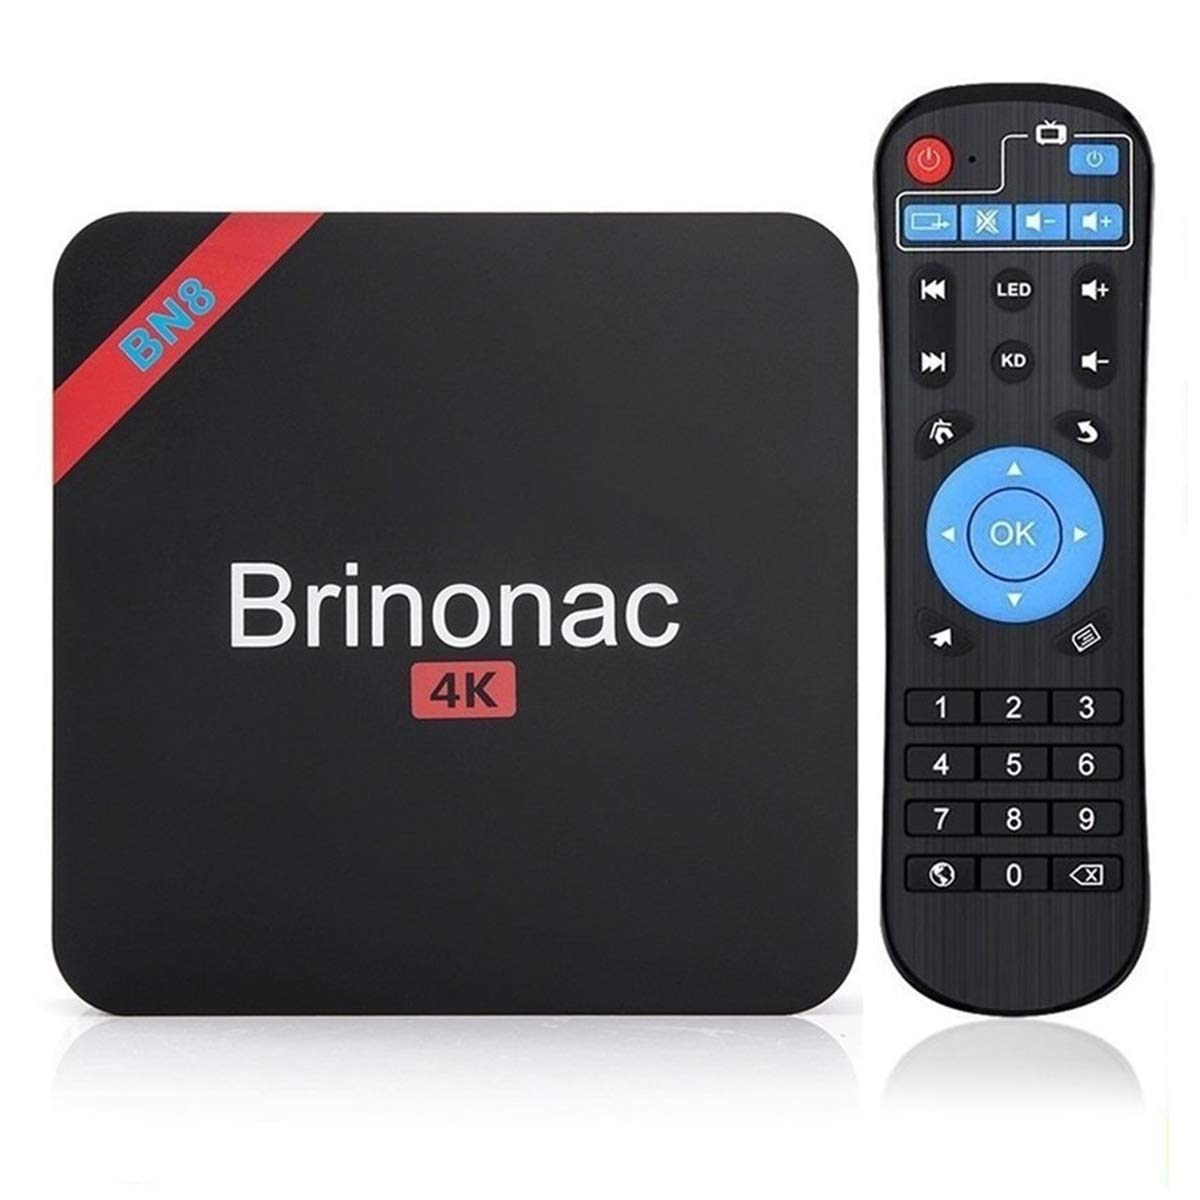 Brinonac BN8S Smart Android 7.1 TV Box Amlogic S905w Quad Core 4K HD Player with Wifi 2G RAM 16G ROM by Brinonac